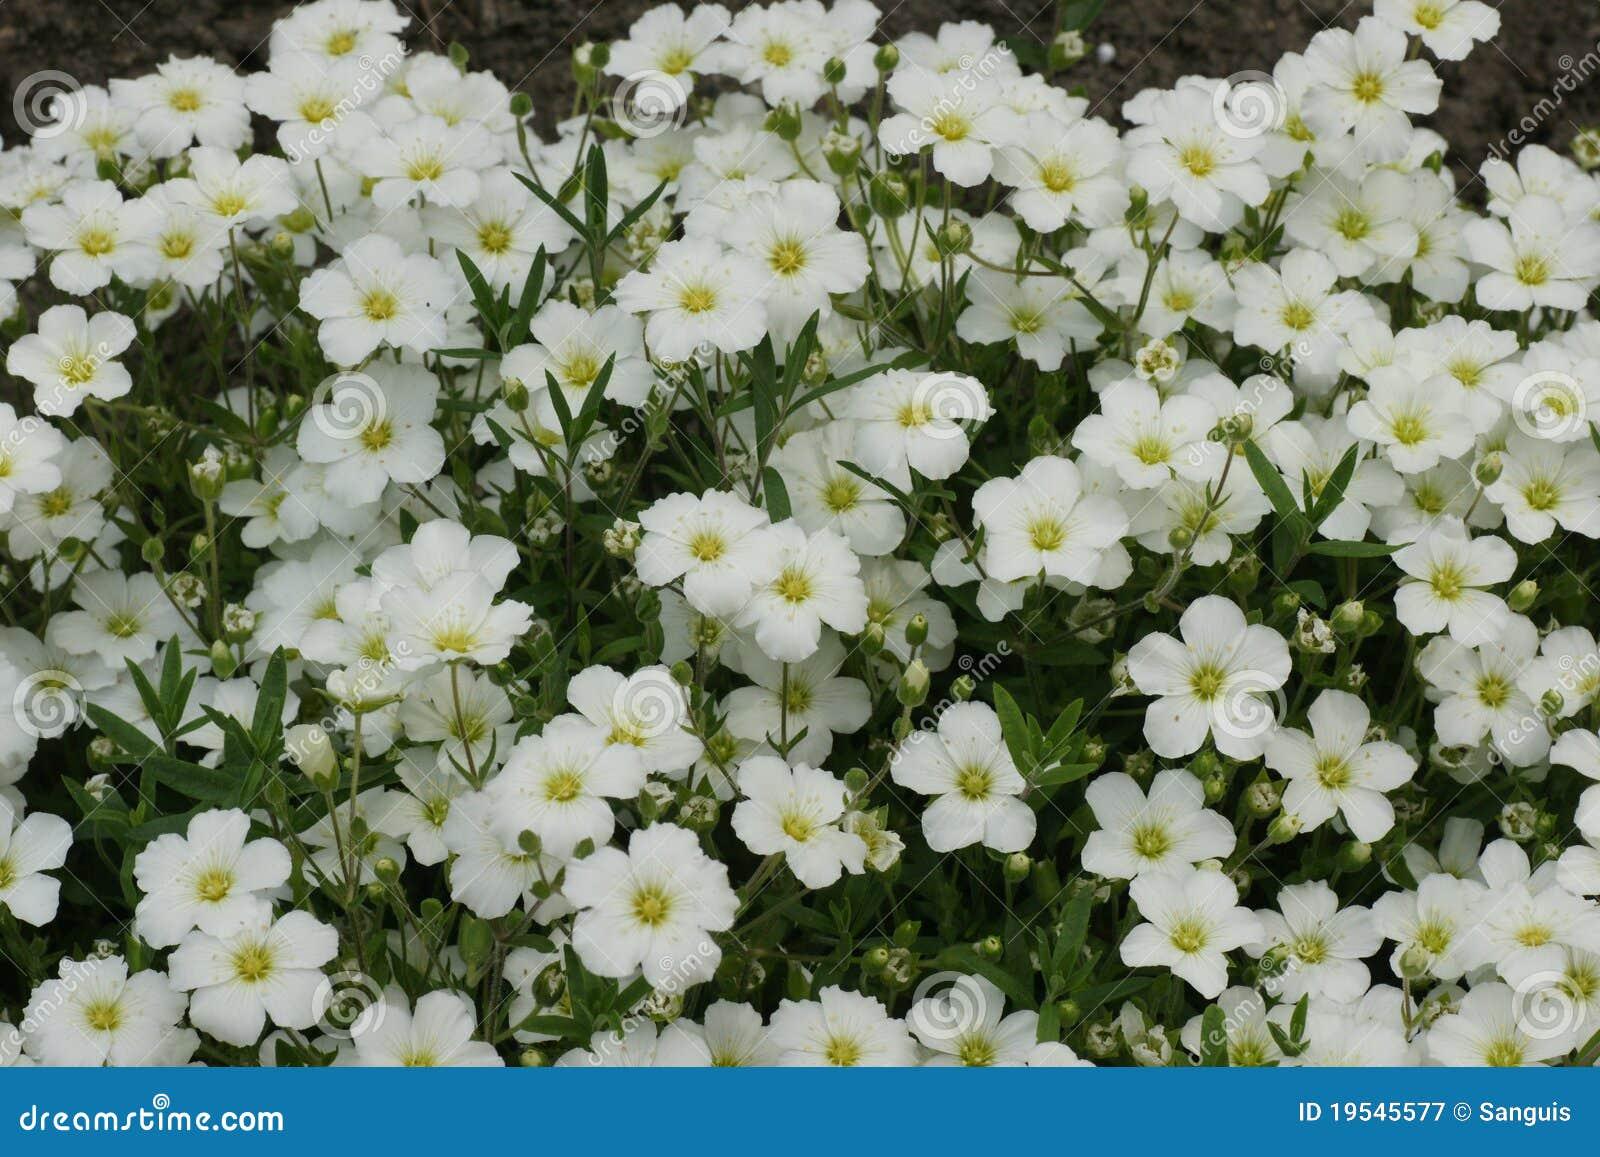 White Flowers Picture. Image  19545577 343f1022e01